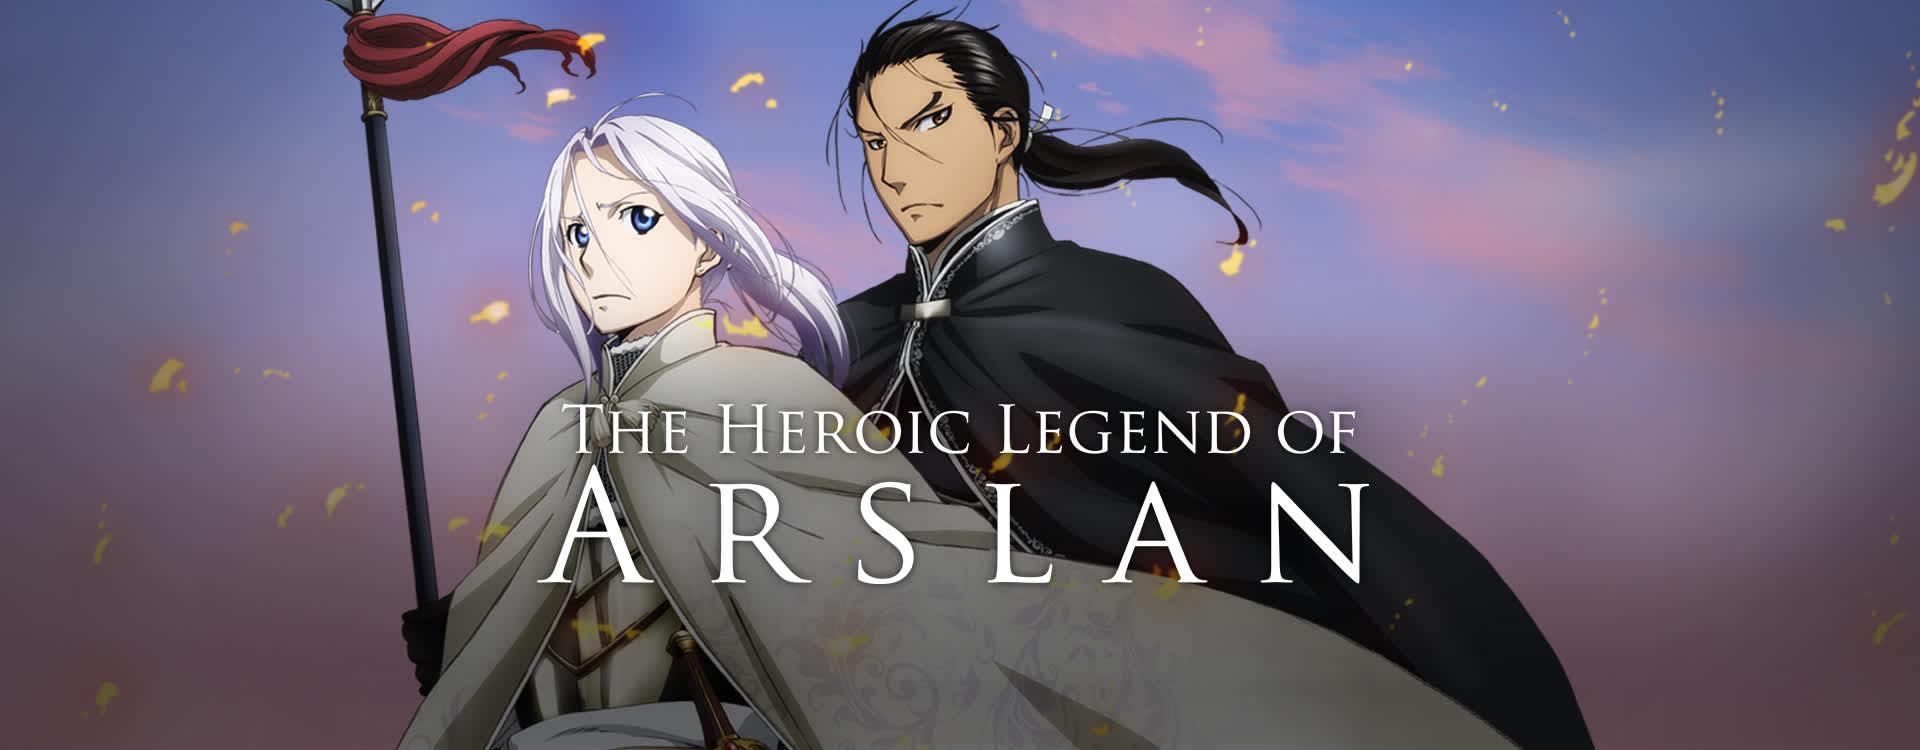 The Heroic Legend of Arslan